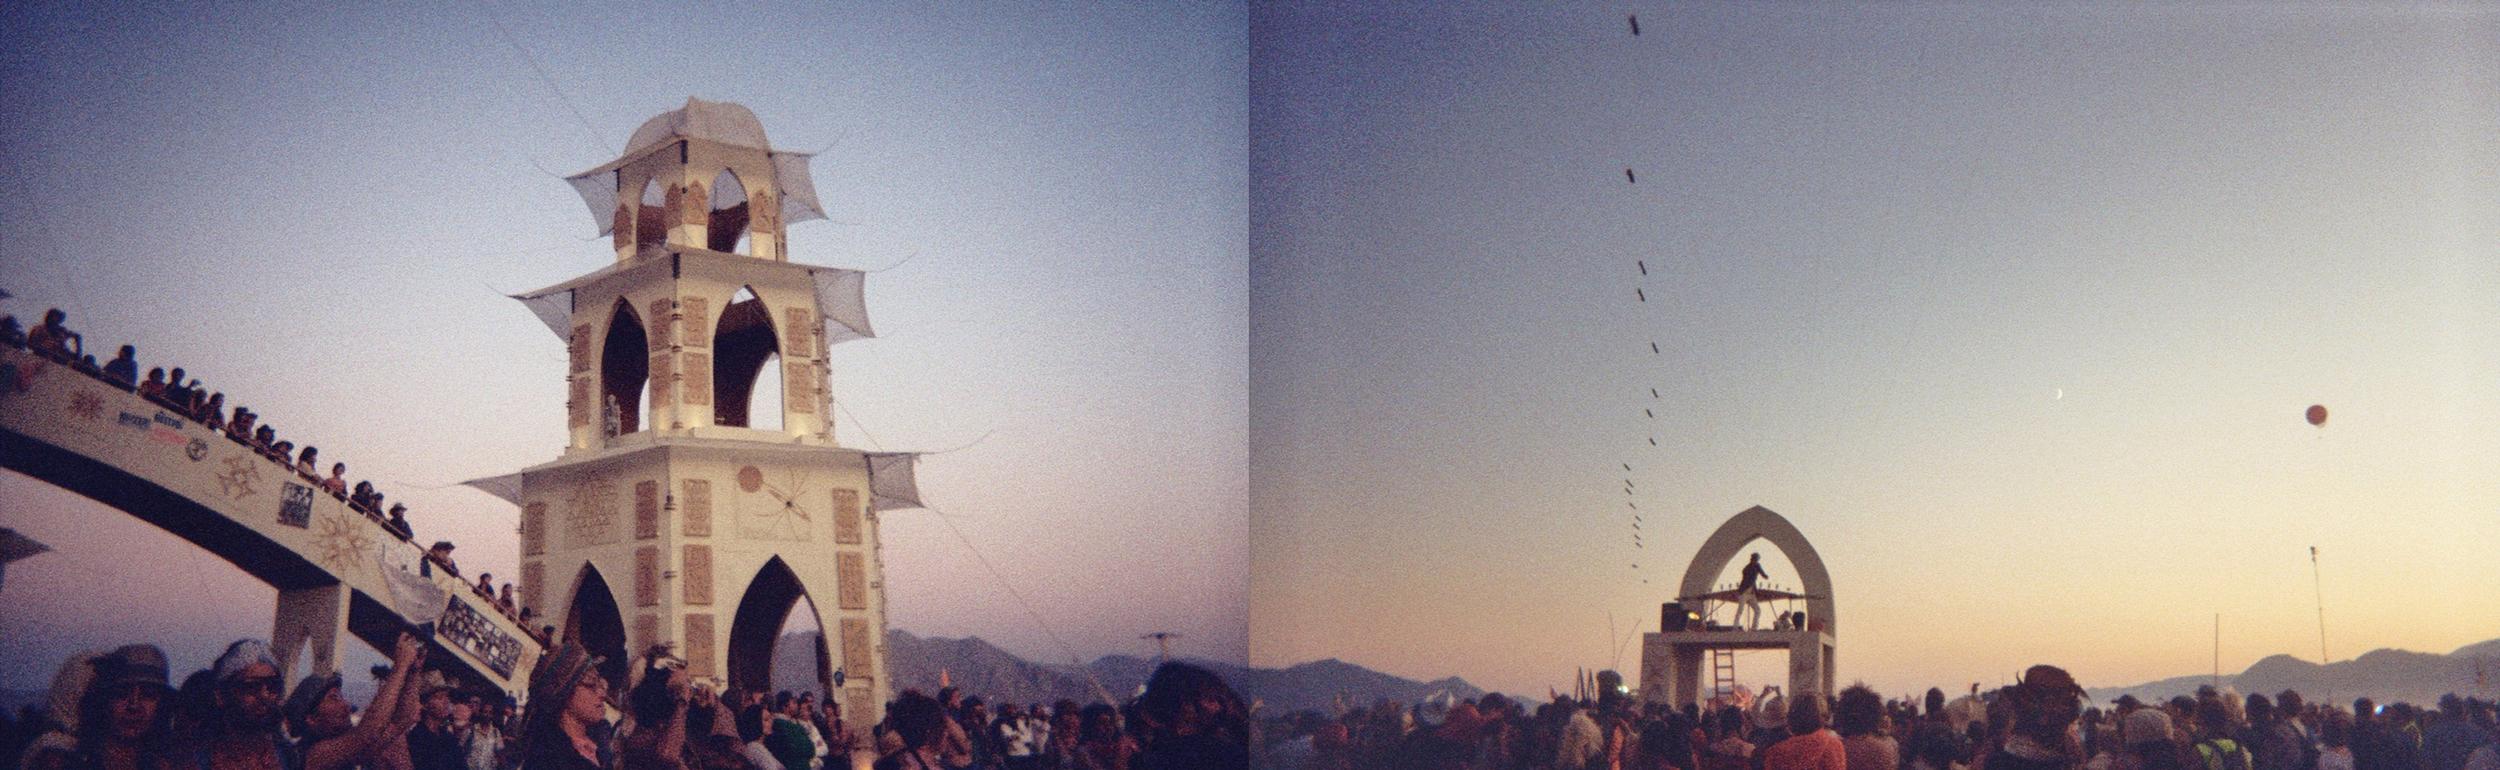 Burning-Man-Black-Rock-City-Temple-Of-Transition-2011-Earth-Harp_Carly-Carpenter.jpg